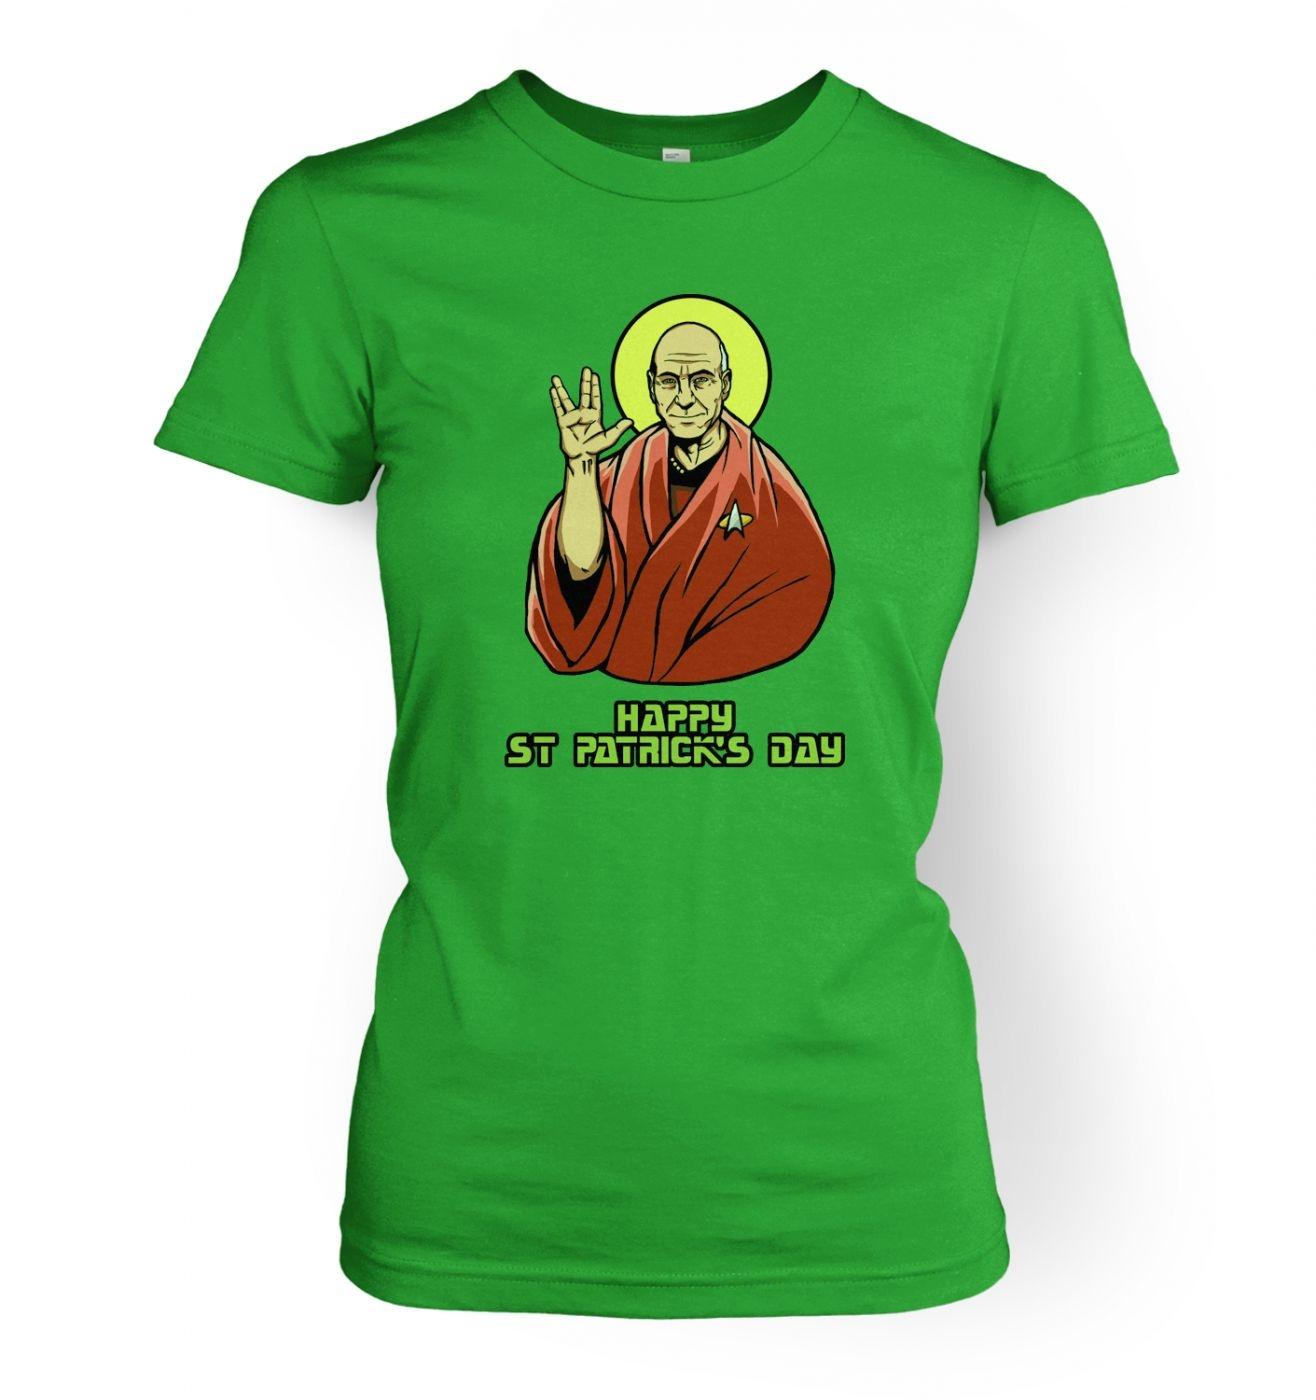 St. Patrick's women's t-shirt